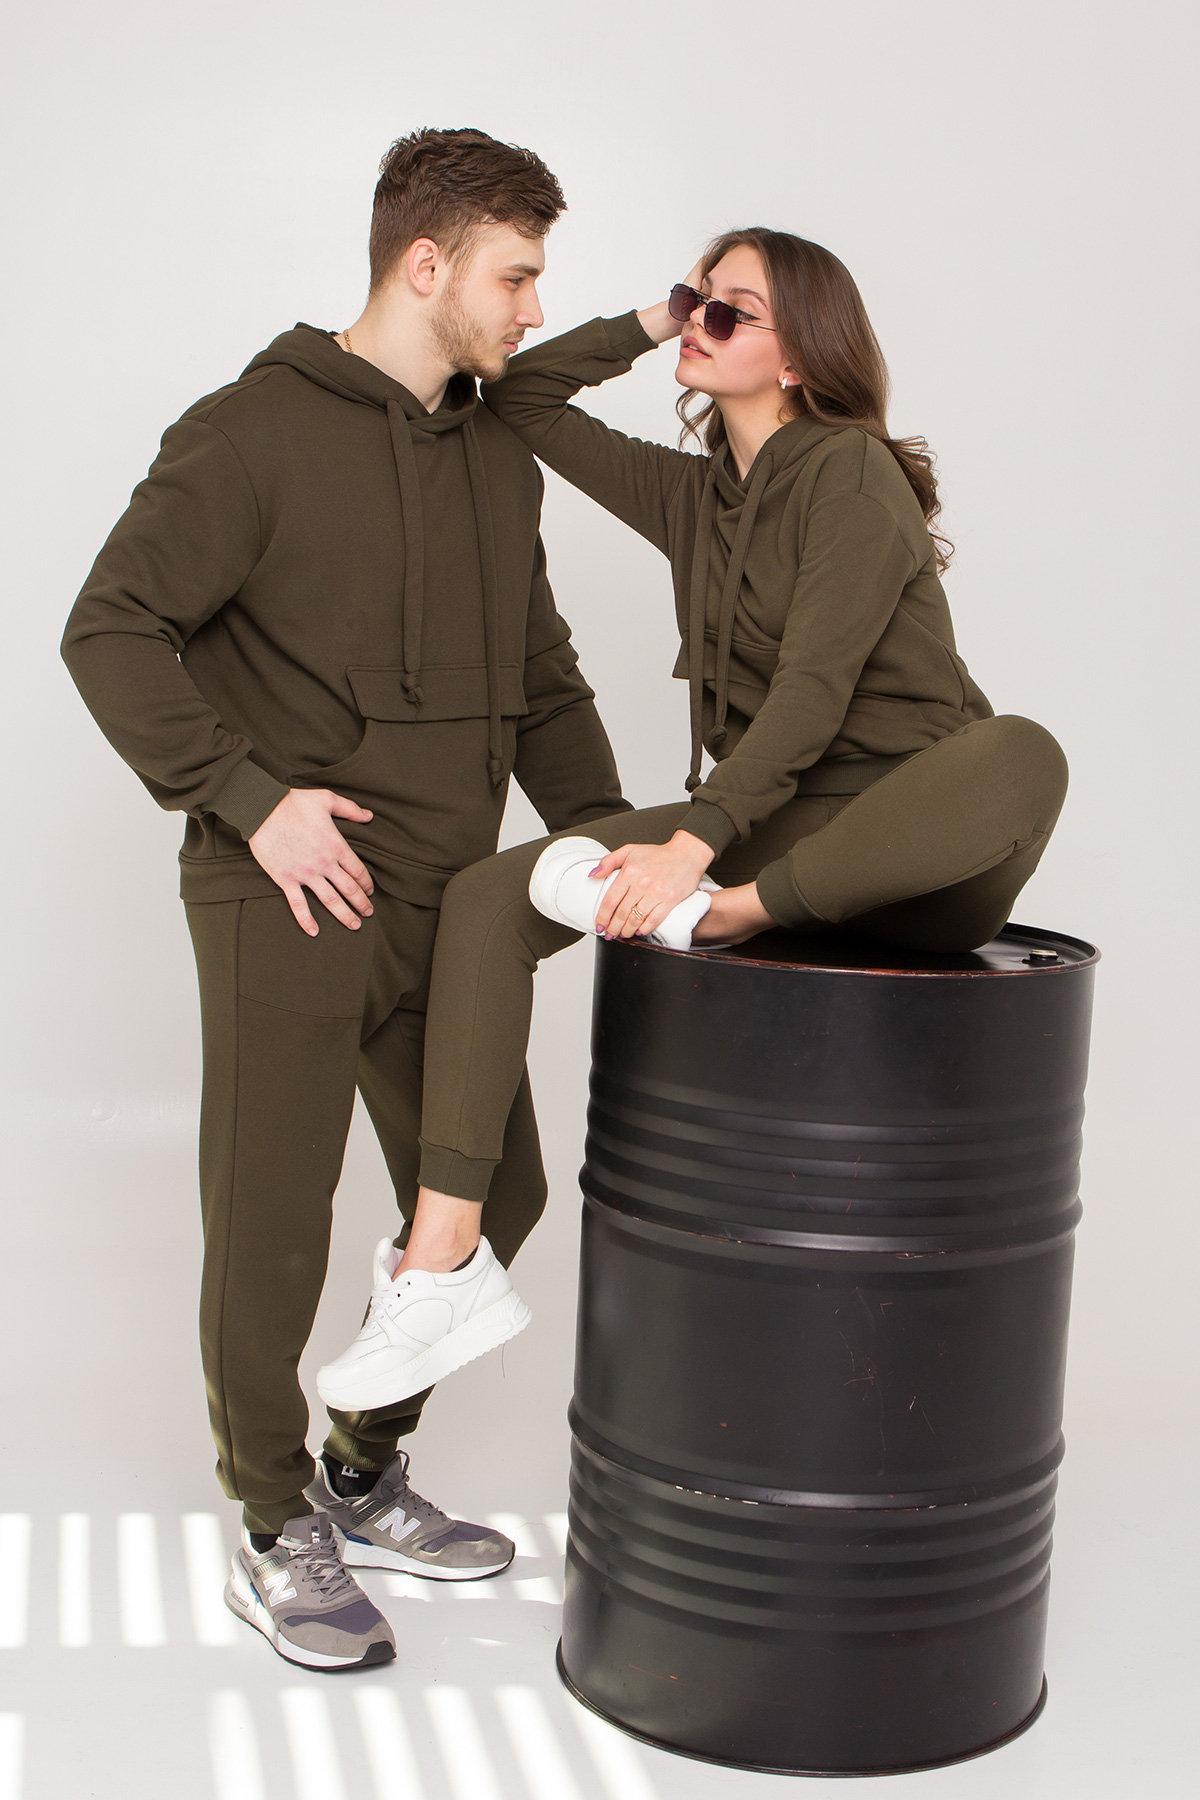 Хелс 3х нитка трикотаж прогулочный костюм 8957 (МУЖСКОЕ)